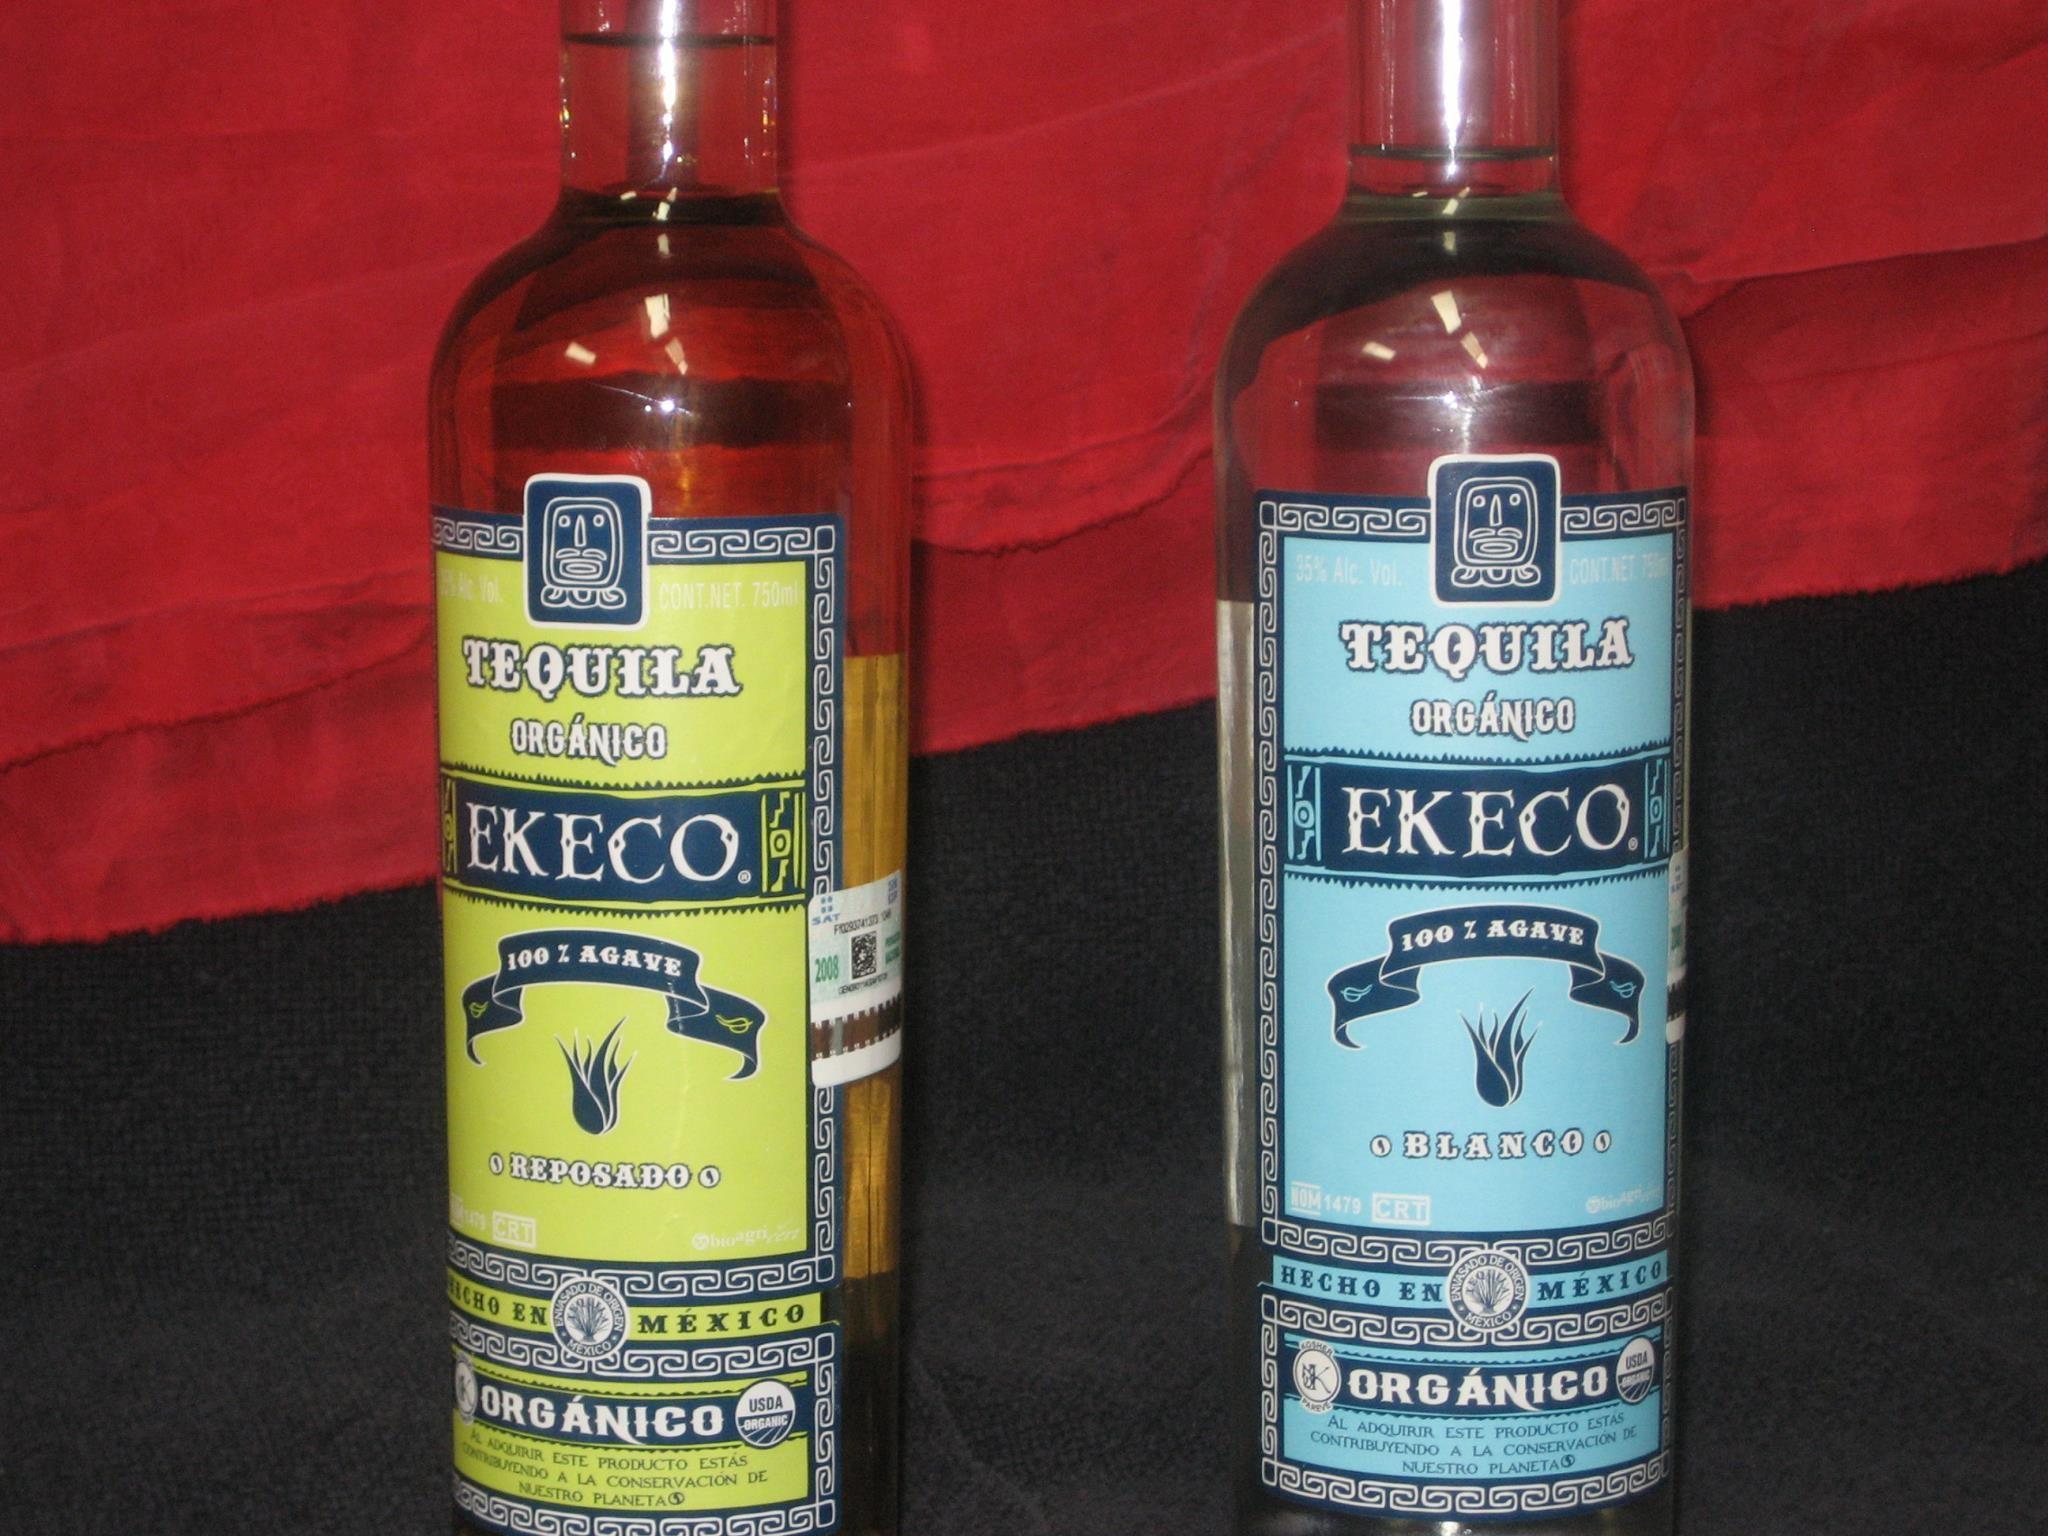 The Last Last Tequila Standing Tequila Vodka Vodka Bottle